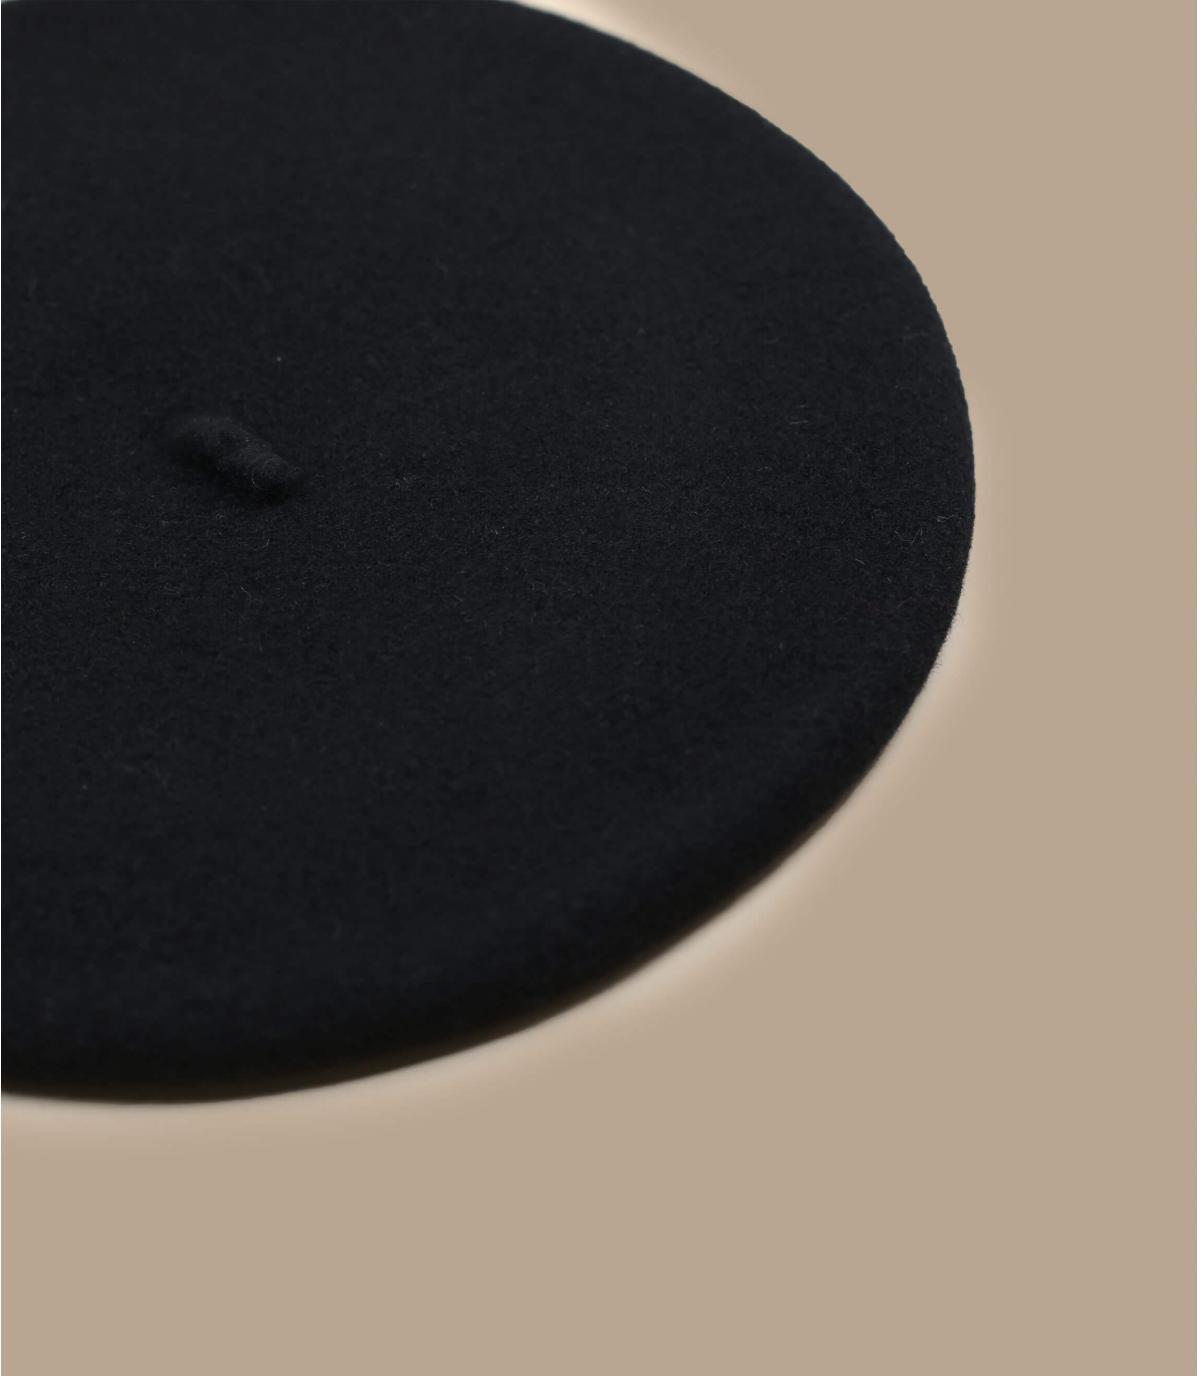 Detalles Black french beret imagen 2